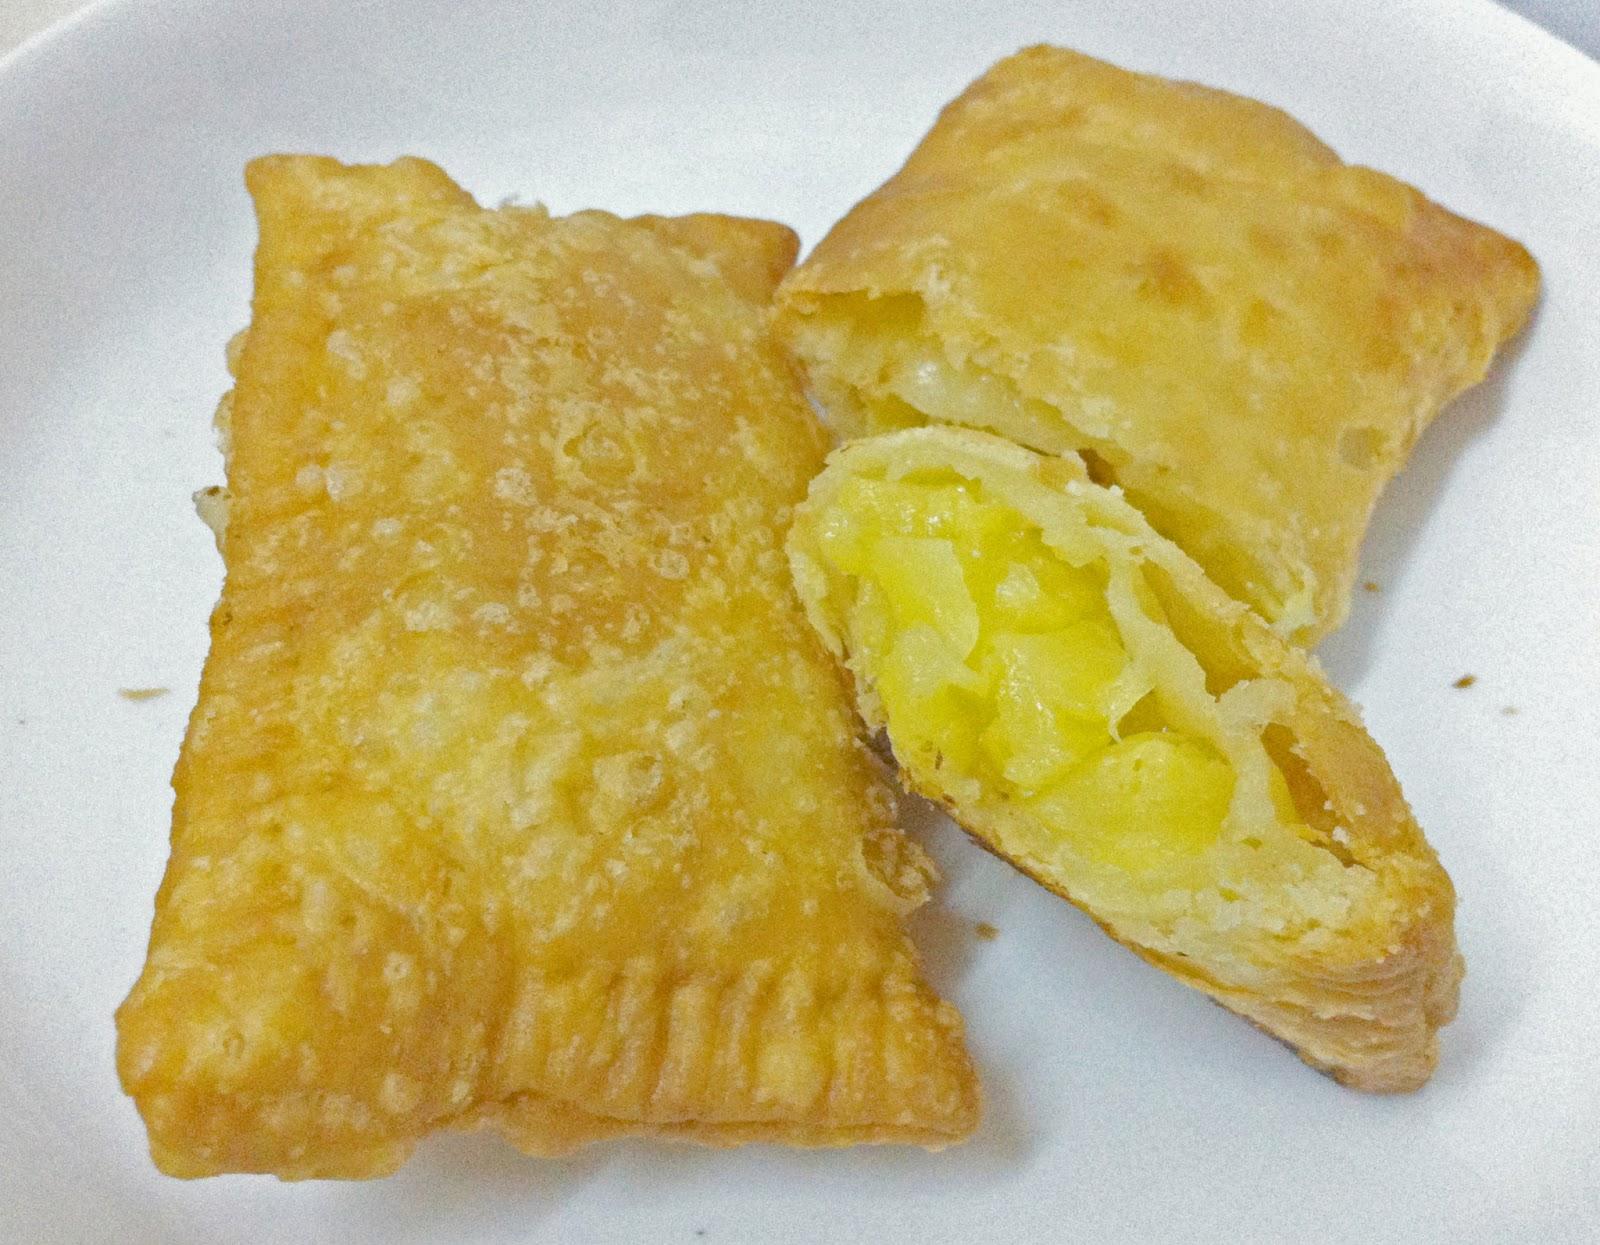 Dia Berkata: Make fried fruit pie now.